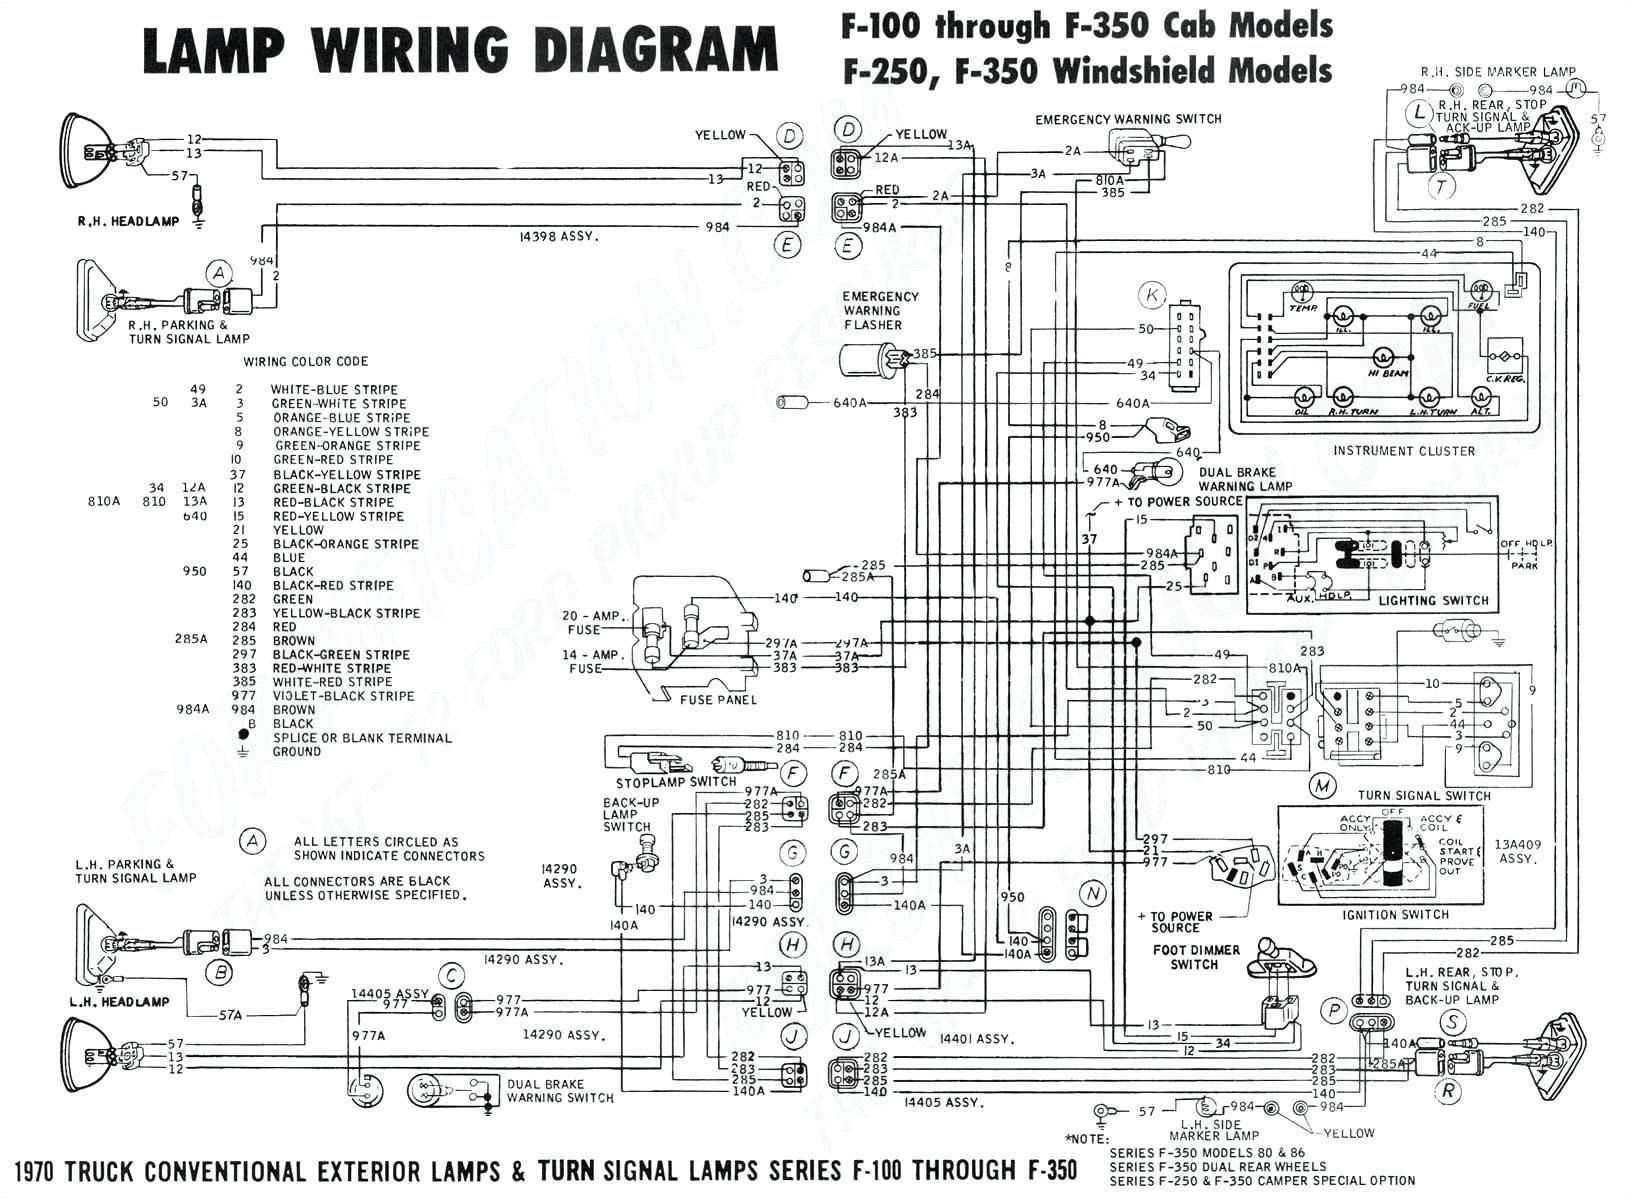 93 wildcat wiring diagram wiring diagram toolbox scag wildcat wiring diagram 93 wildcat wiring diagram data